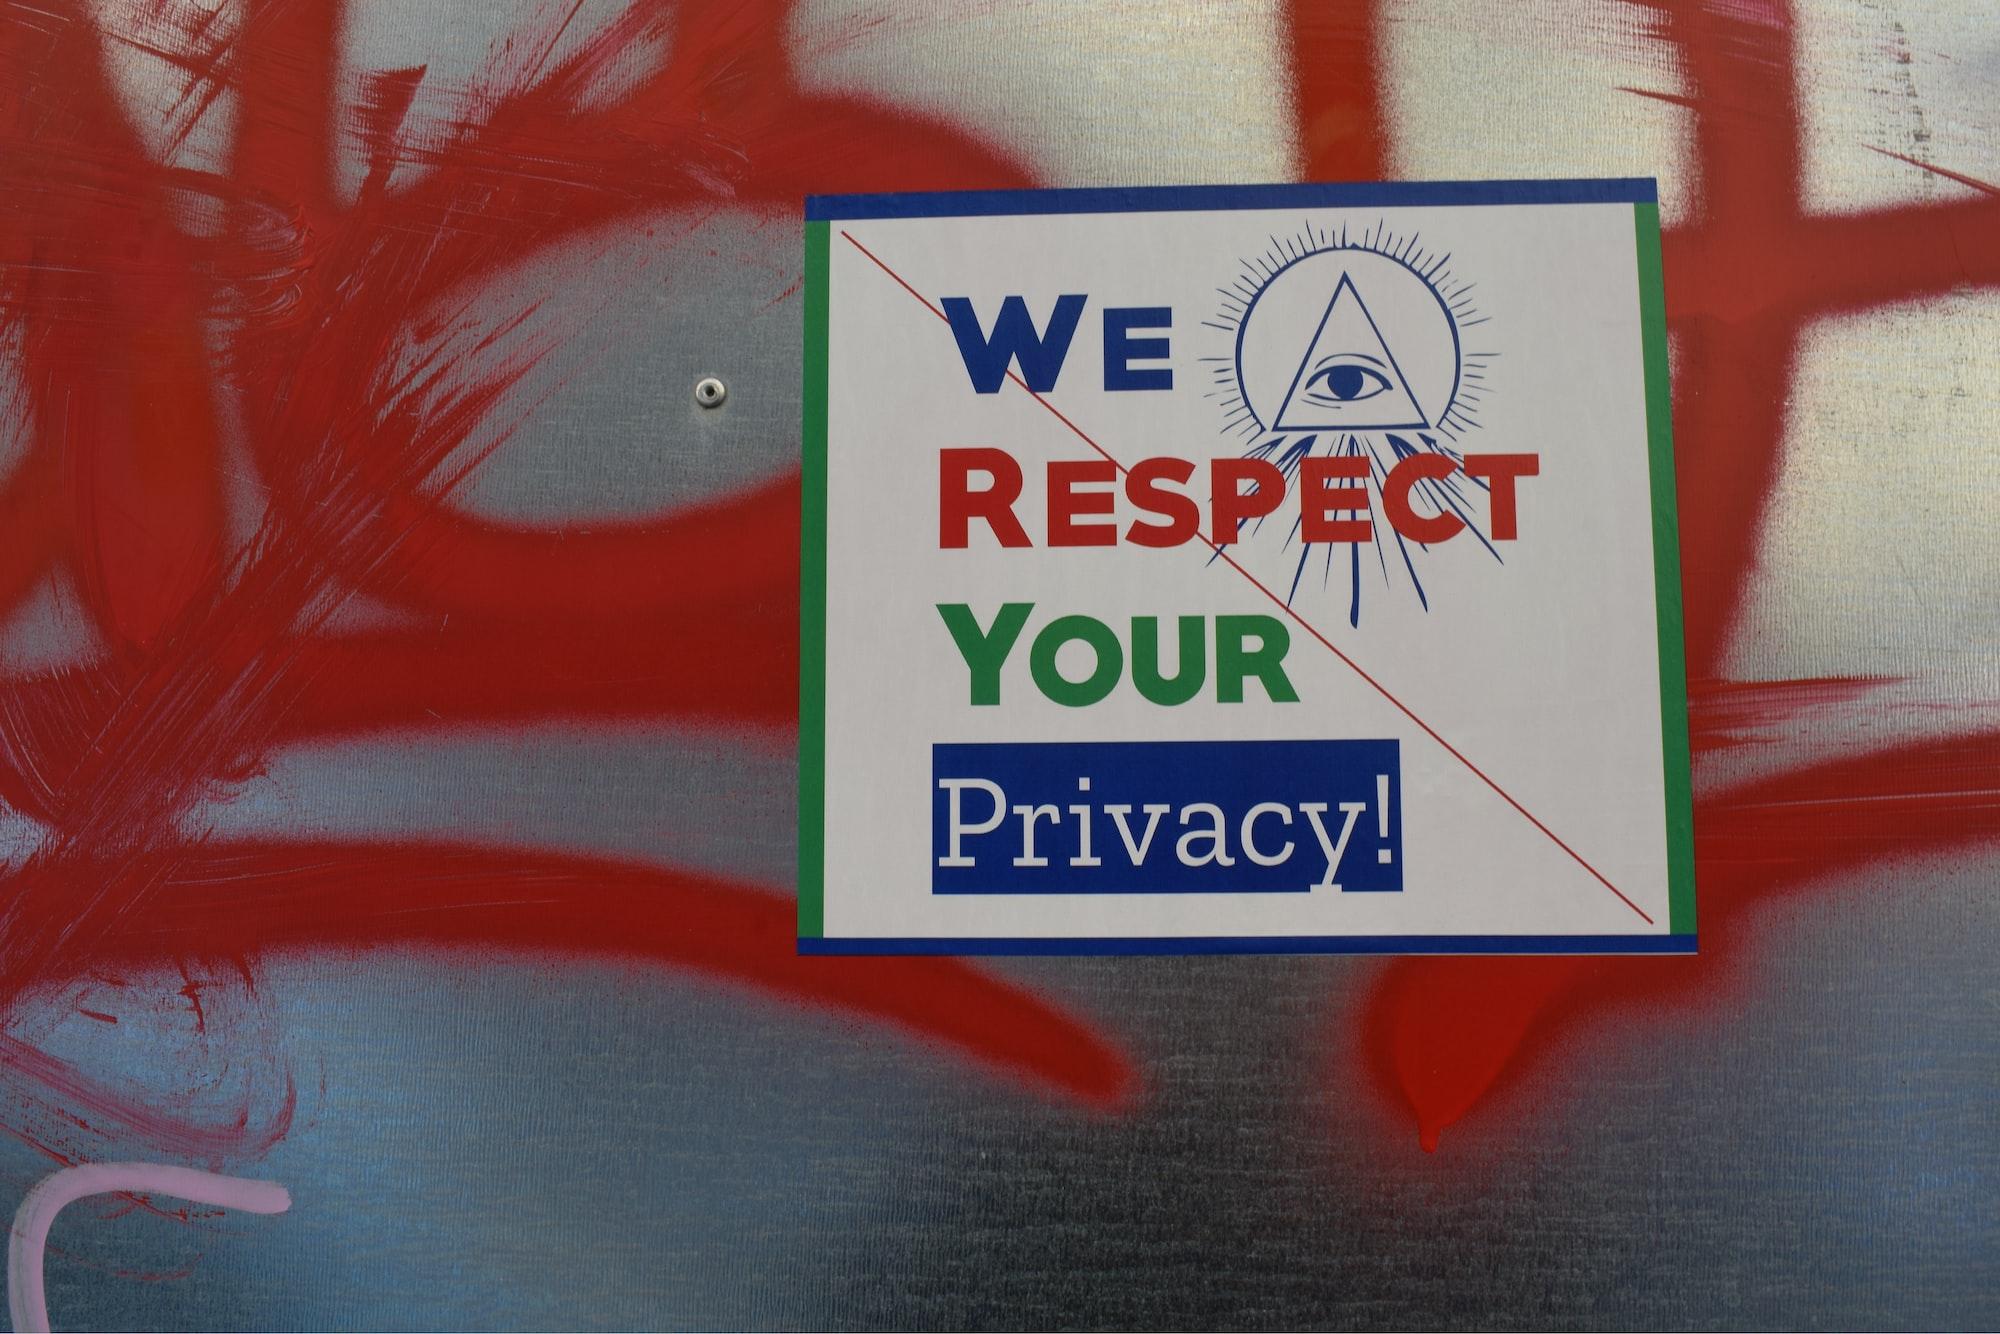 Make Windows 10 Respect Our Privacy Even More